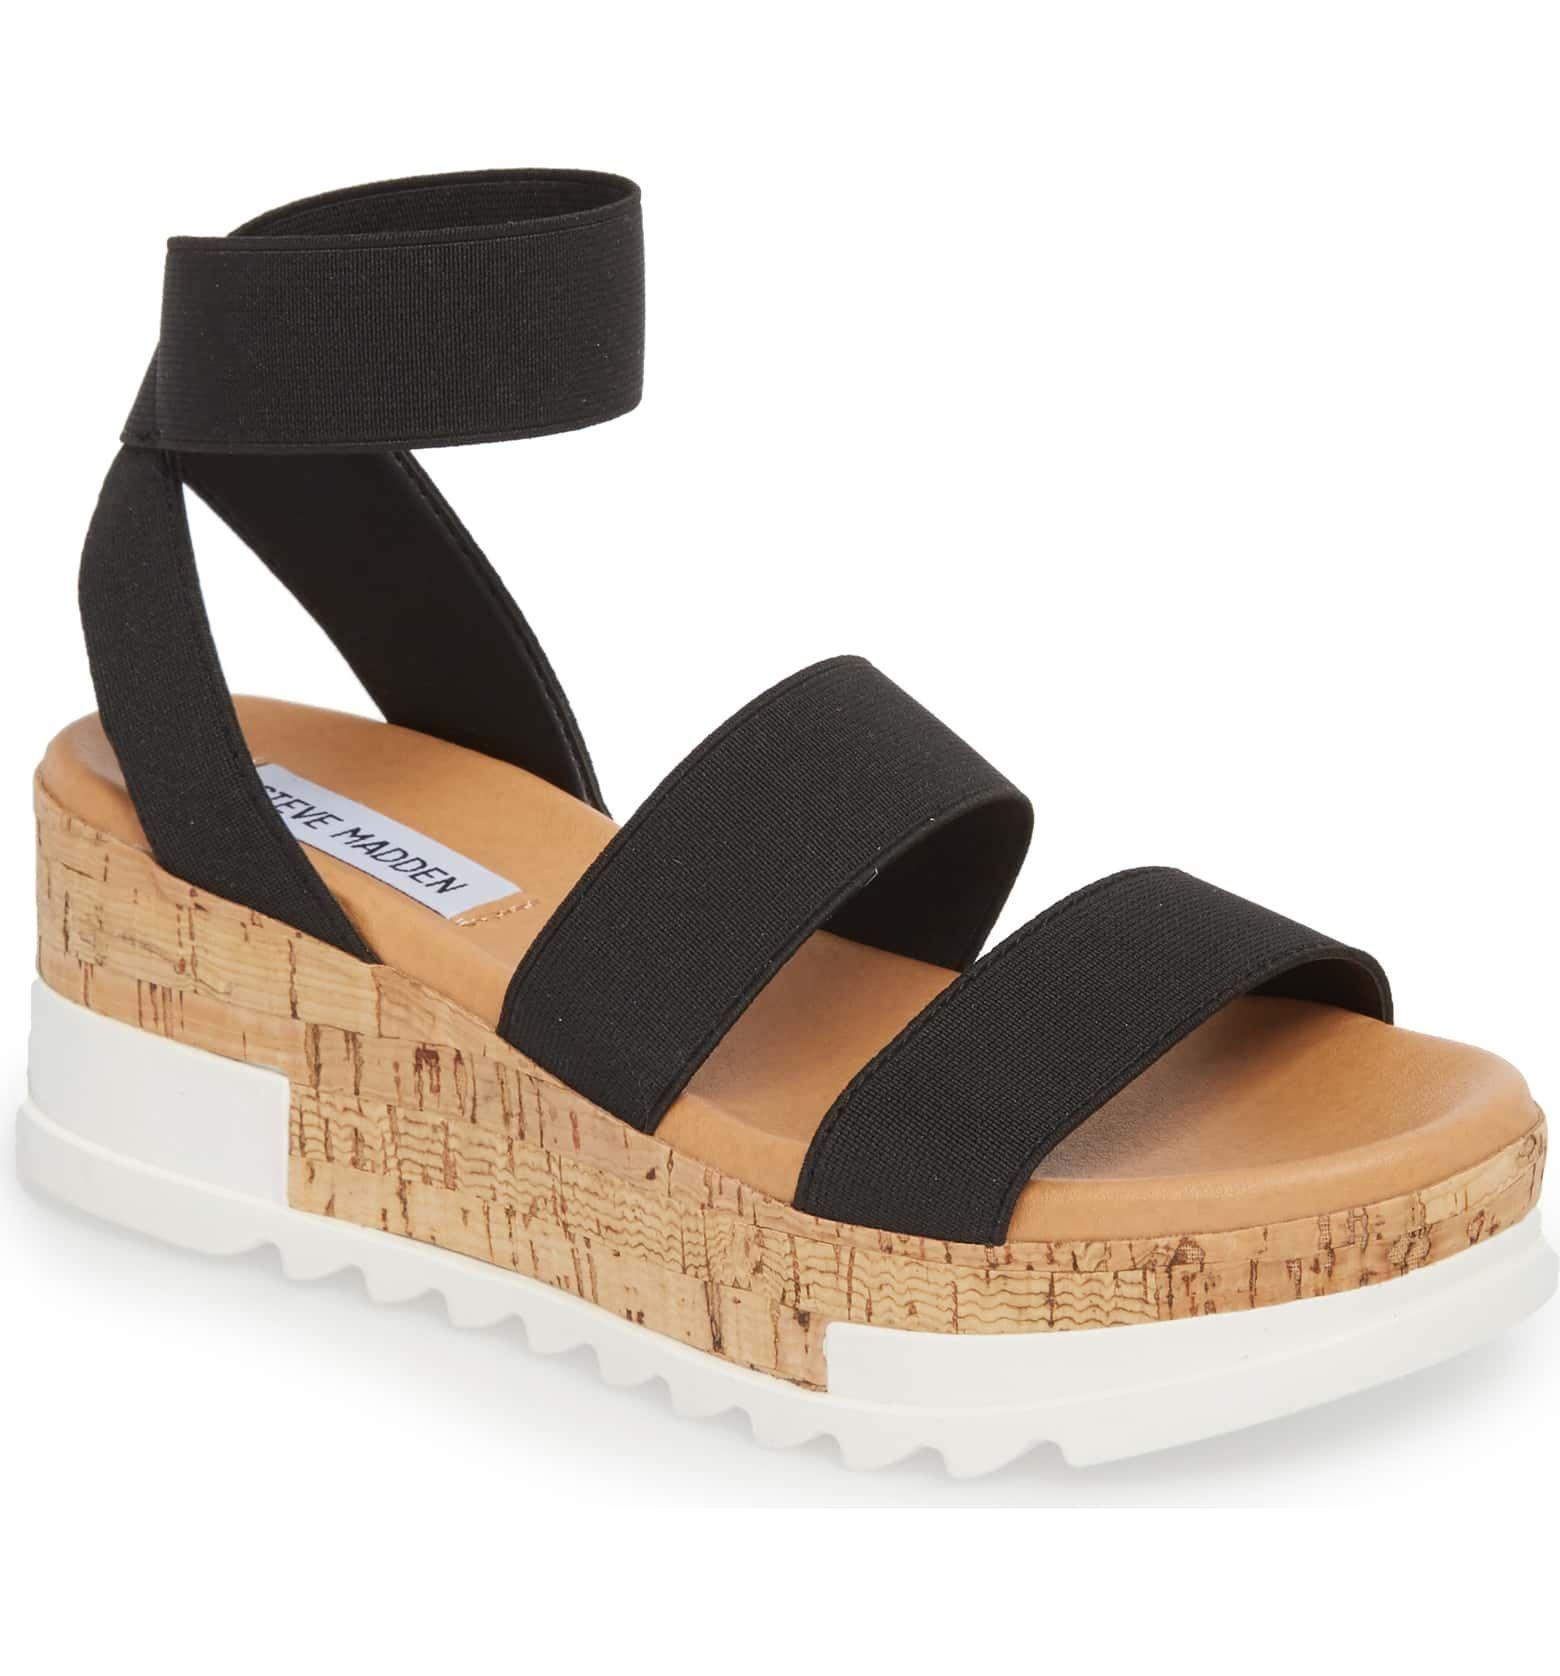 f30d0ea9d12 Bandi Platform Wedge Sandal